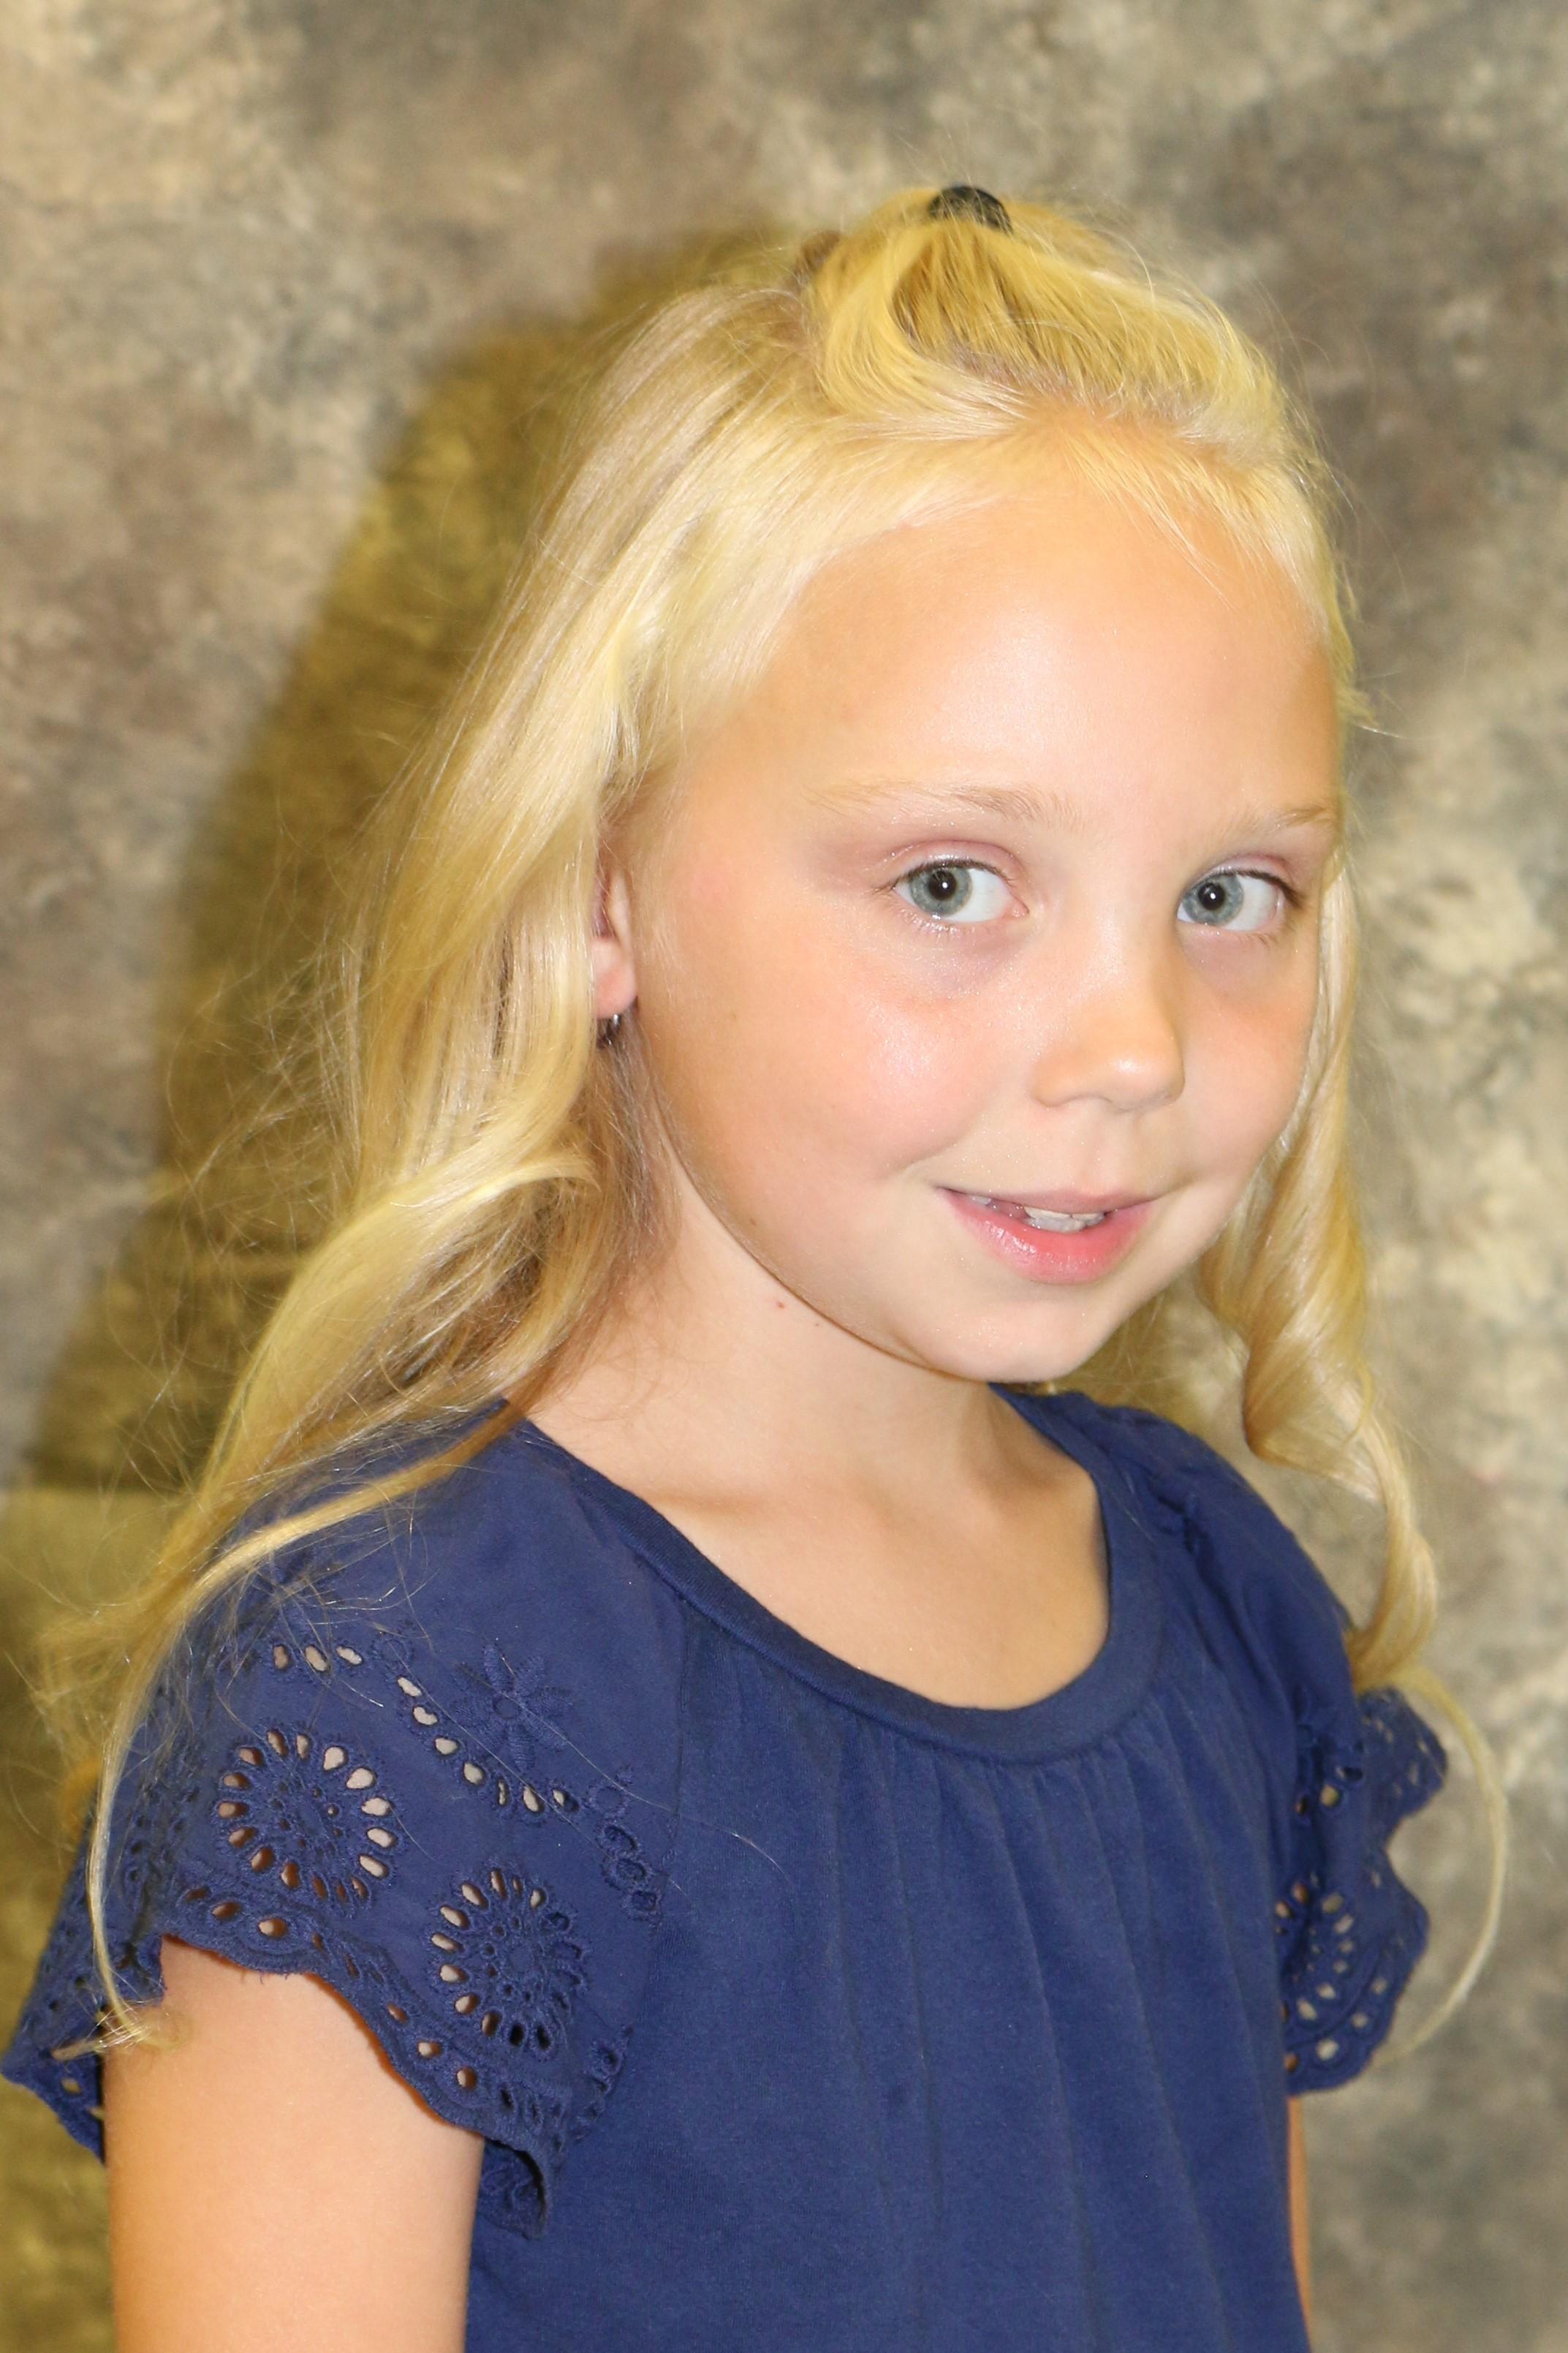 Little Miss Contestant - Adalynn Riddle 8